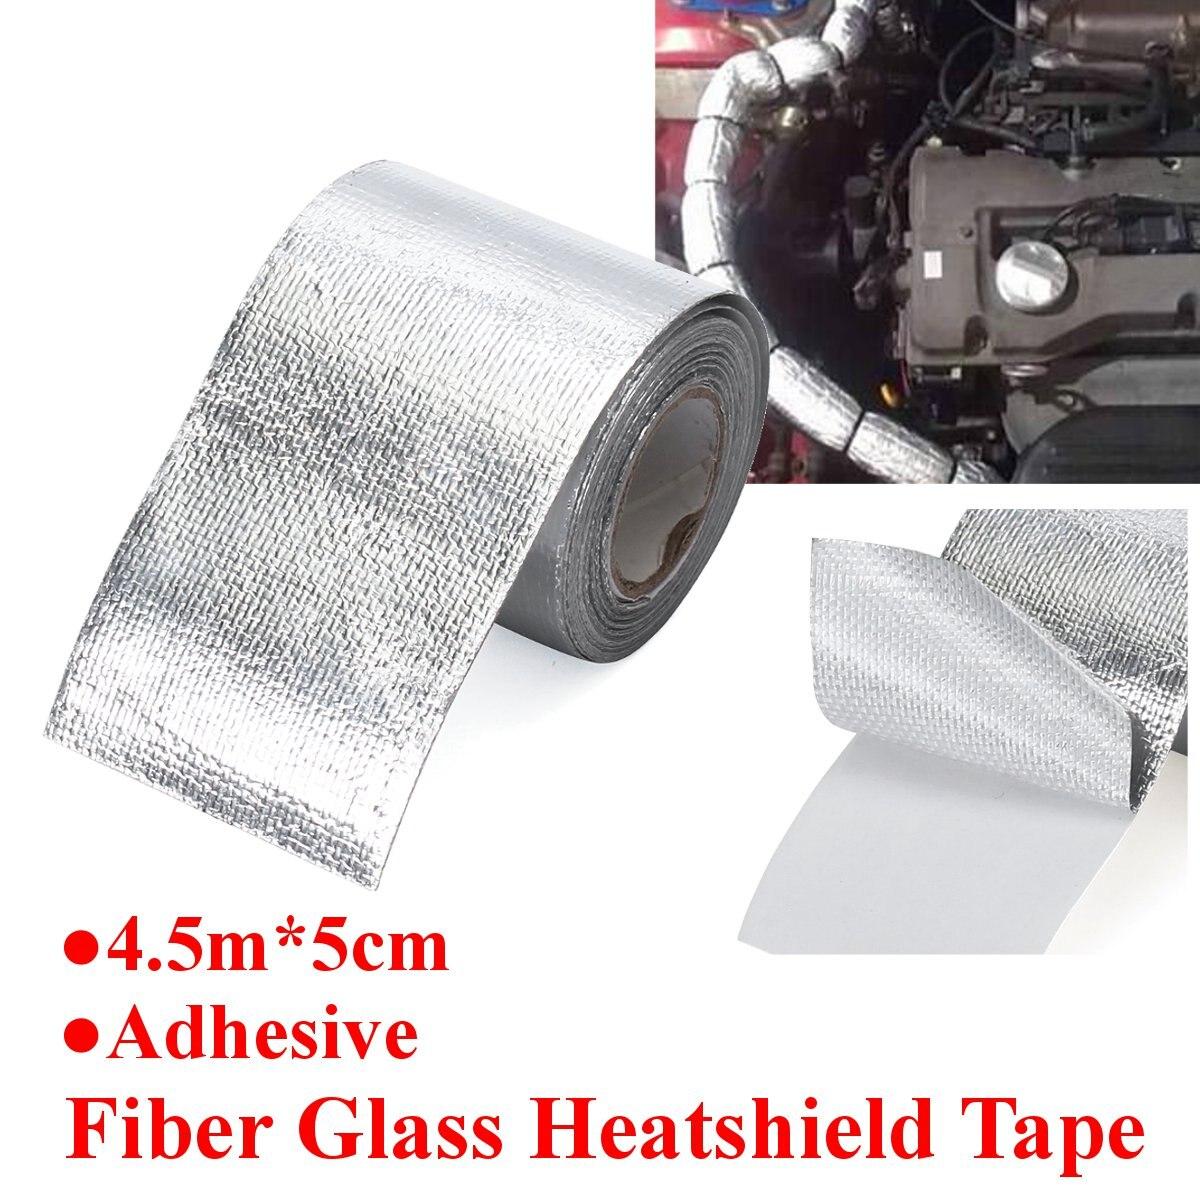 1 rolo Heatshield Fita De Fibra De Vidro Retardador de Chama de Calor Escudo Adesivo Auto Thermoshield Reflexivo Tira de Fibra de vidro Envoltório De Calor